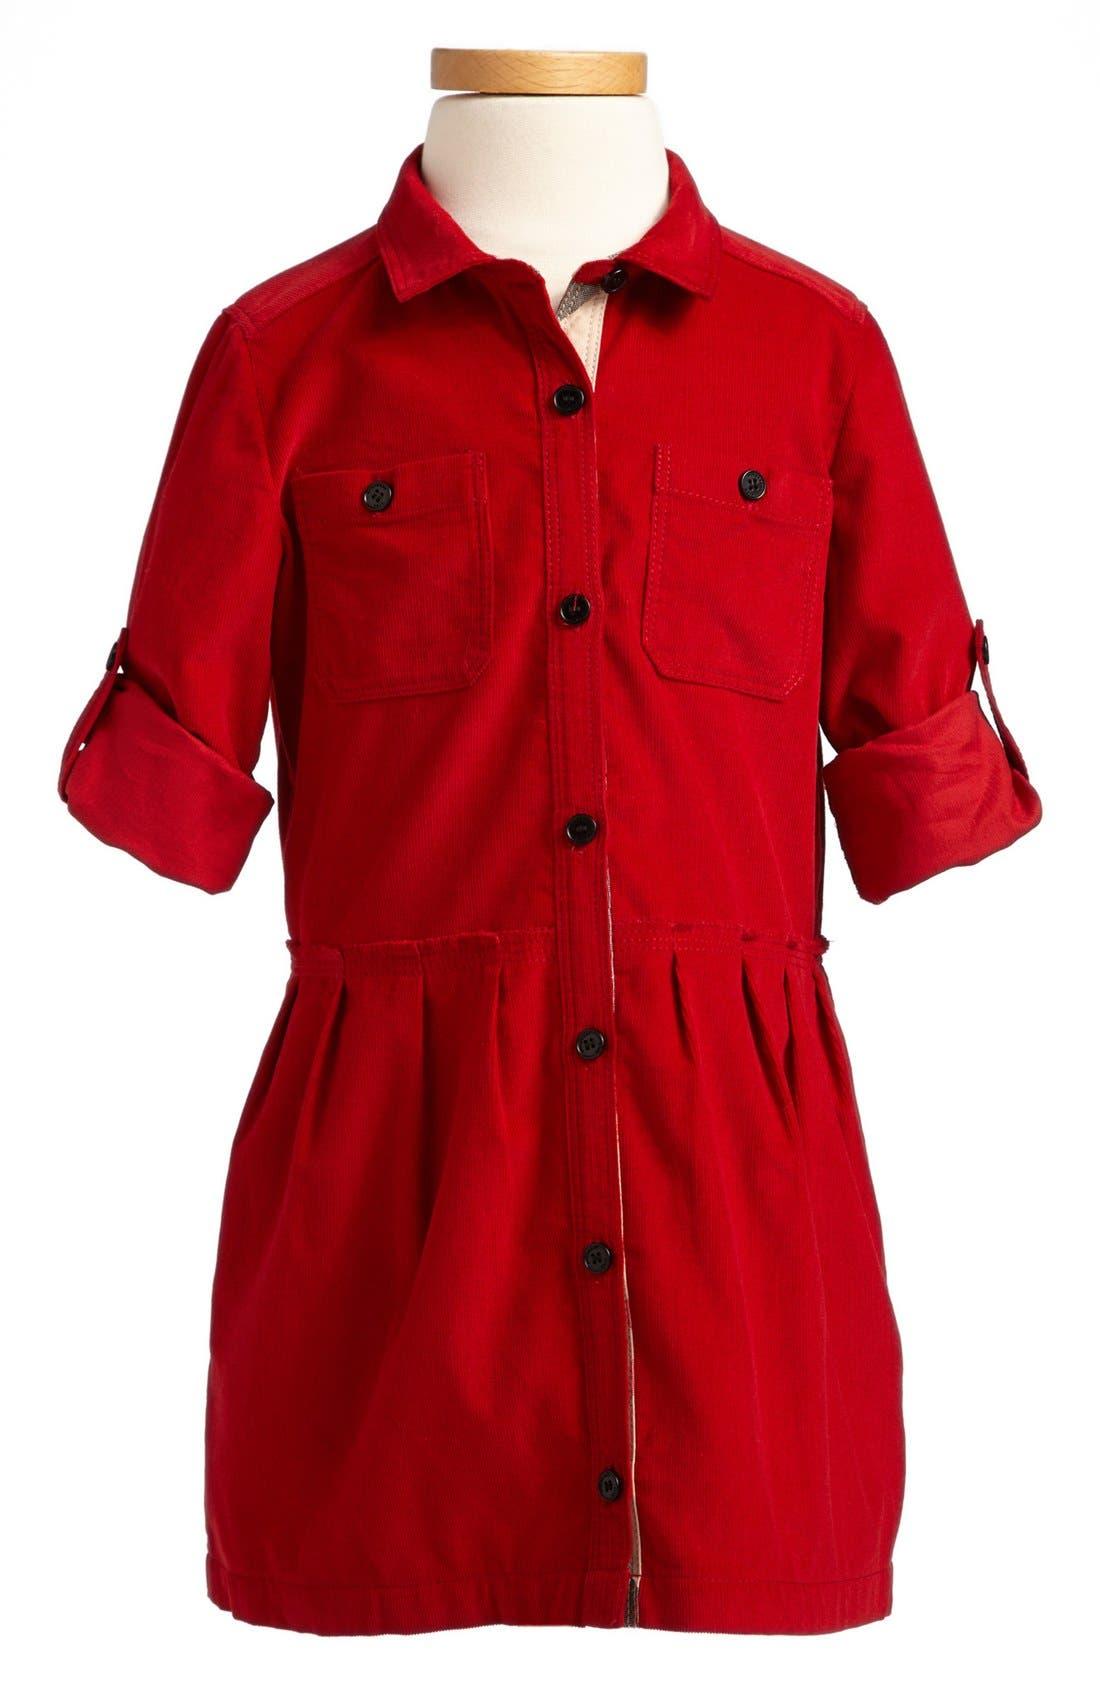 Main Image - Burberry Corduroy Dress (Toddler Girls, Little Girls & Big Girls)